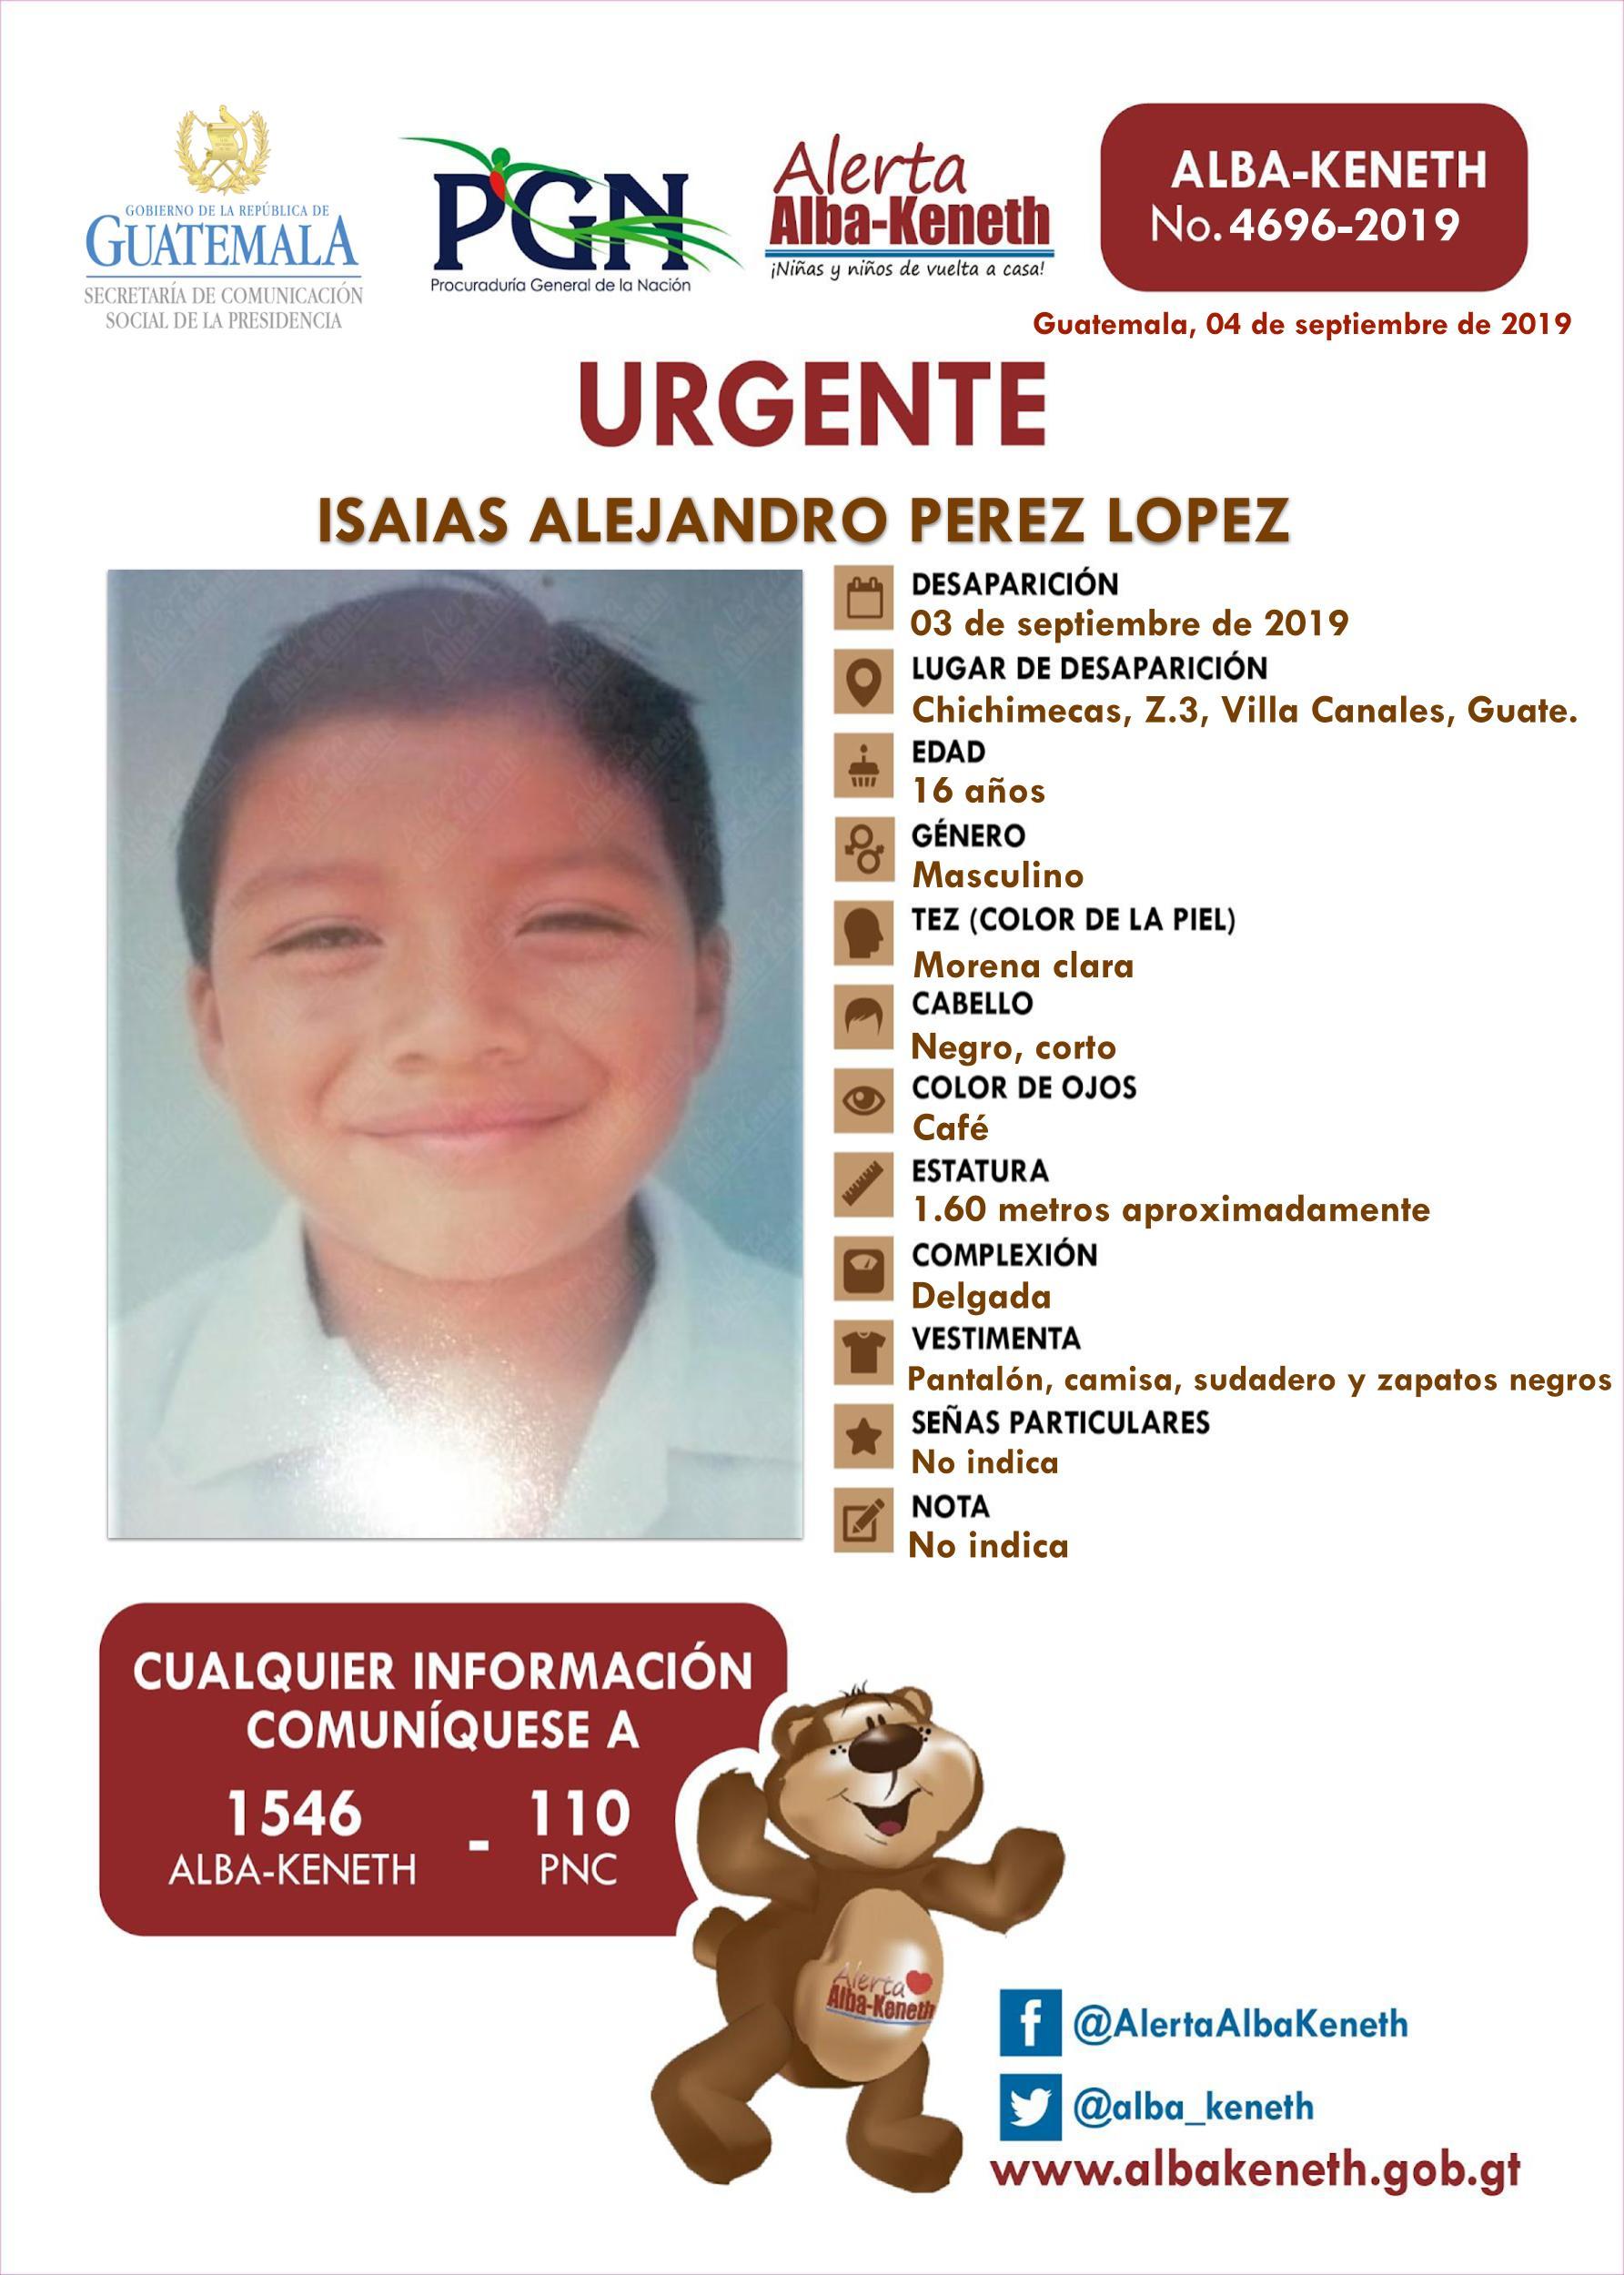 Isaias Alejandro Perez Lopez